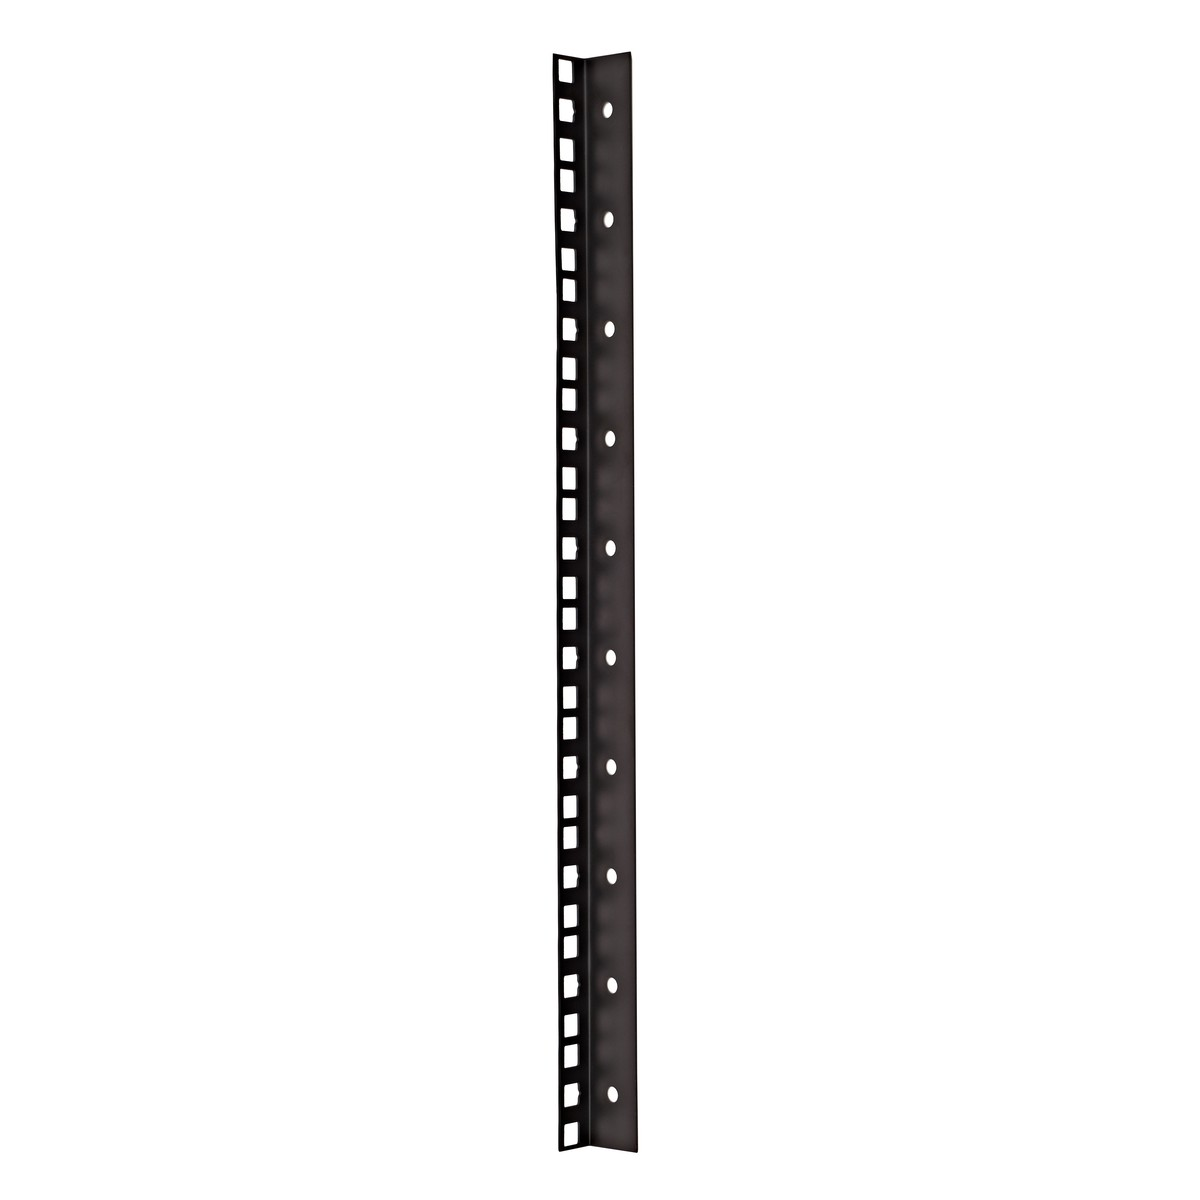 "19"" Rack Strip by Gear4music 10U Length"